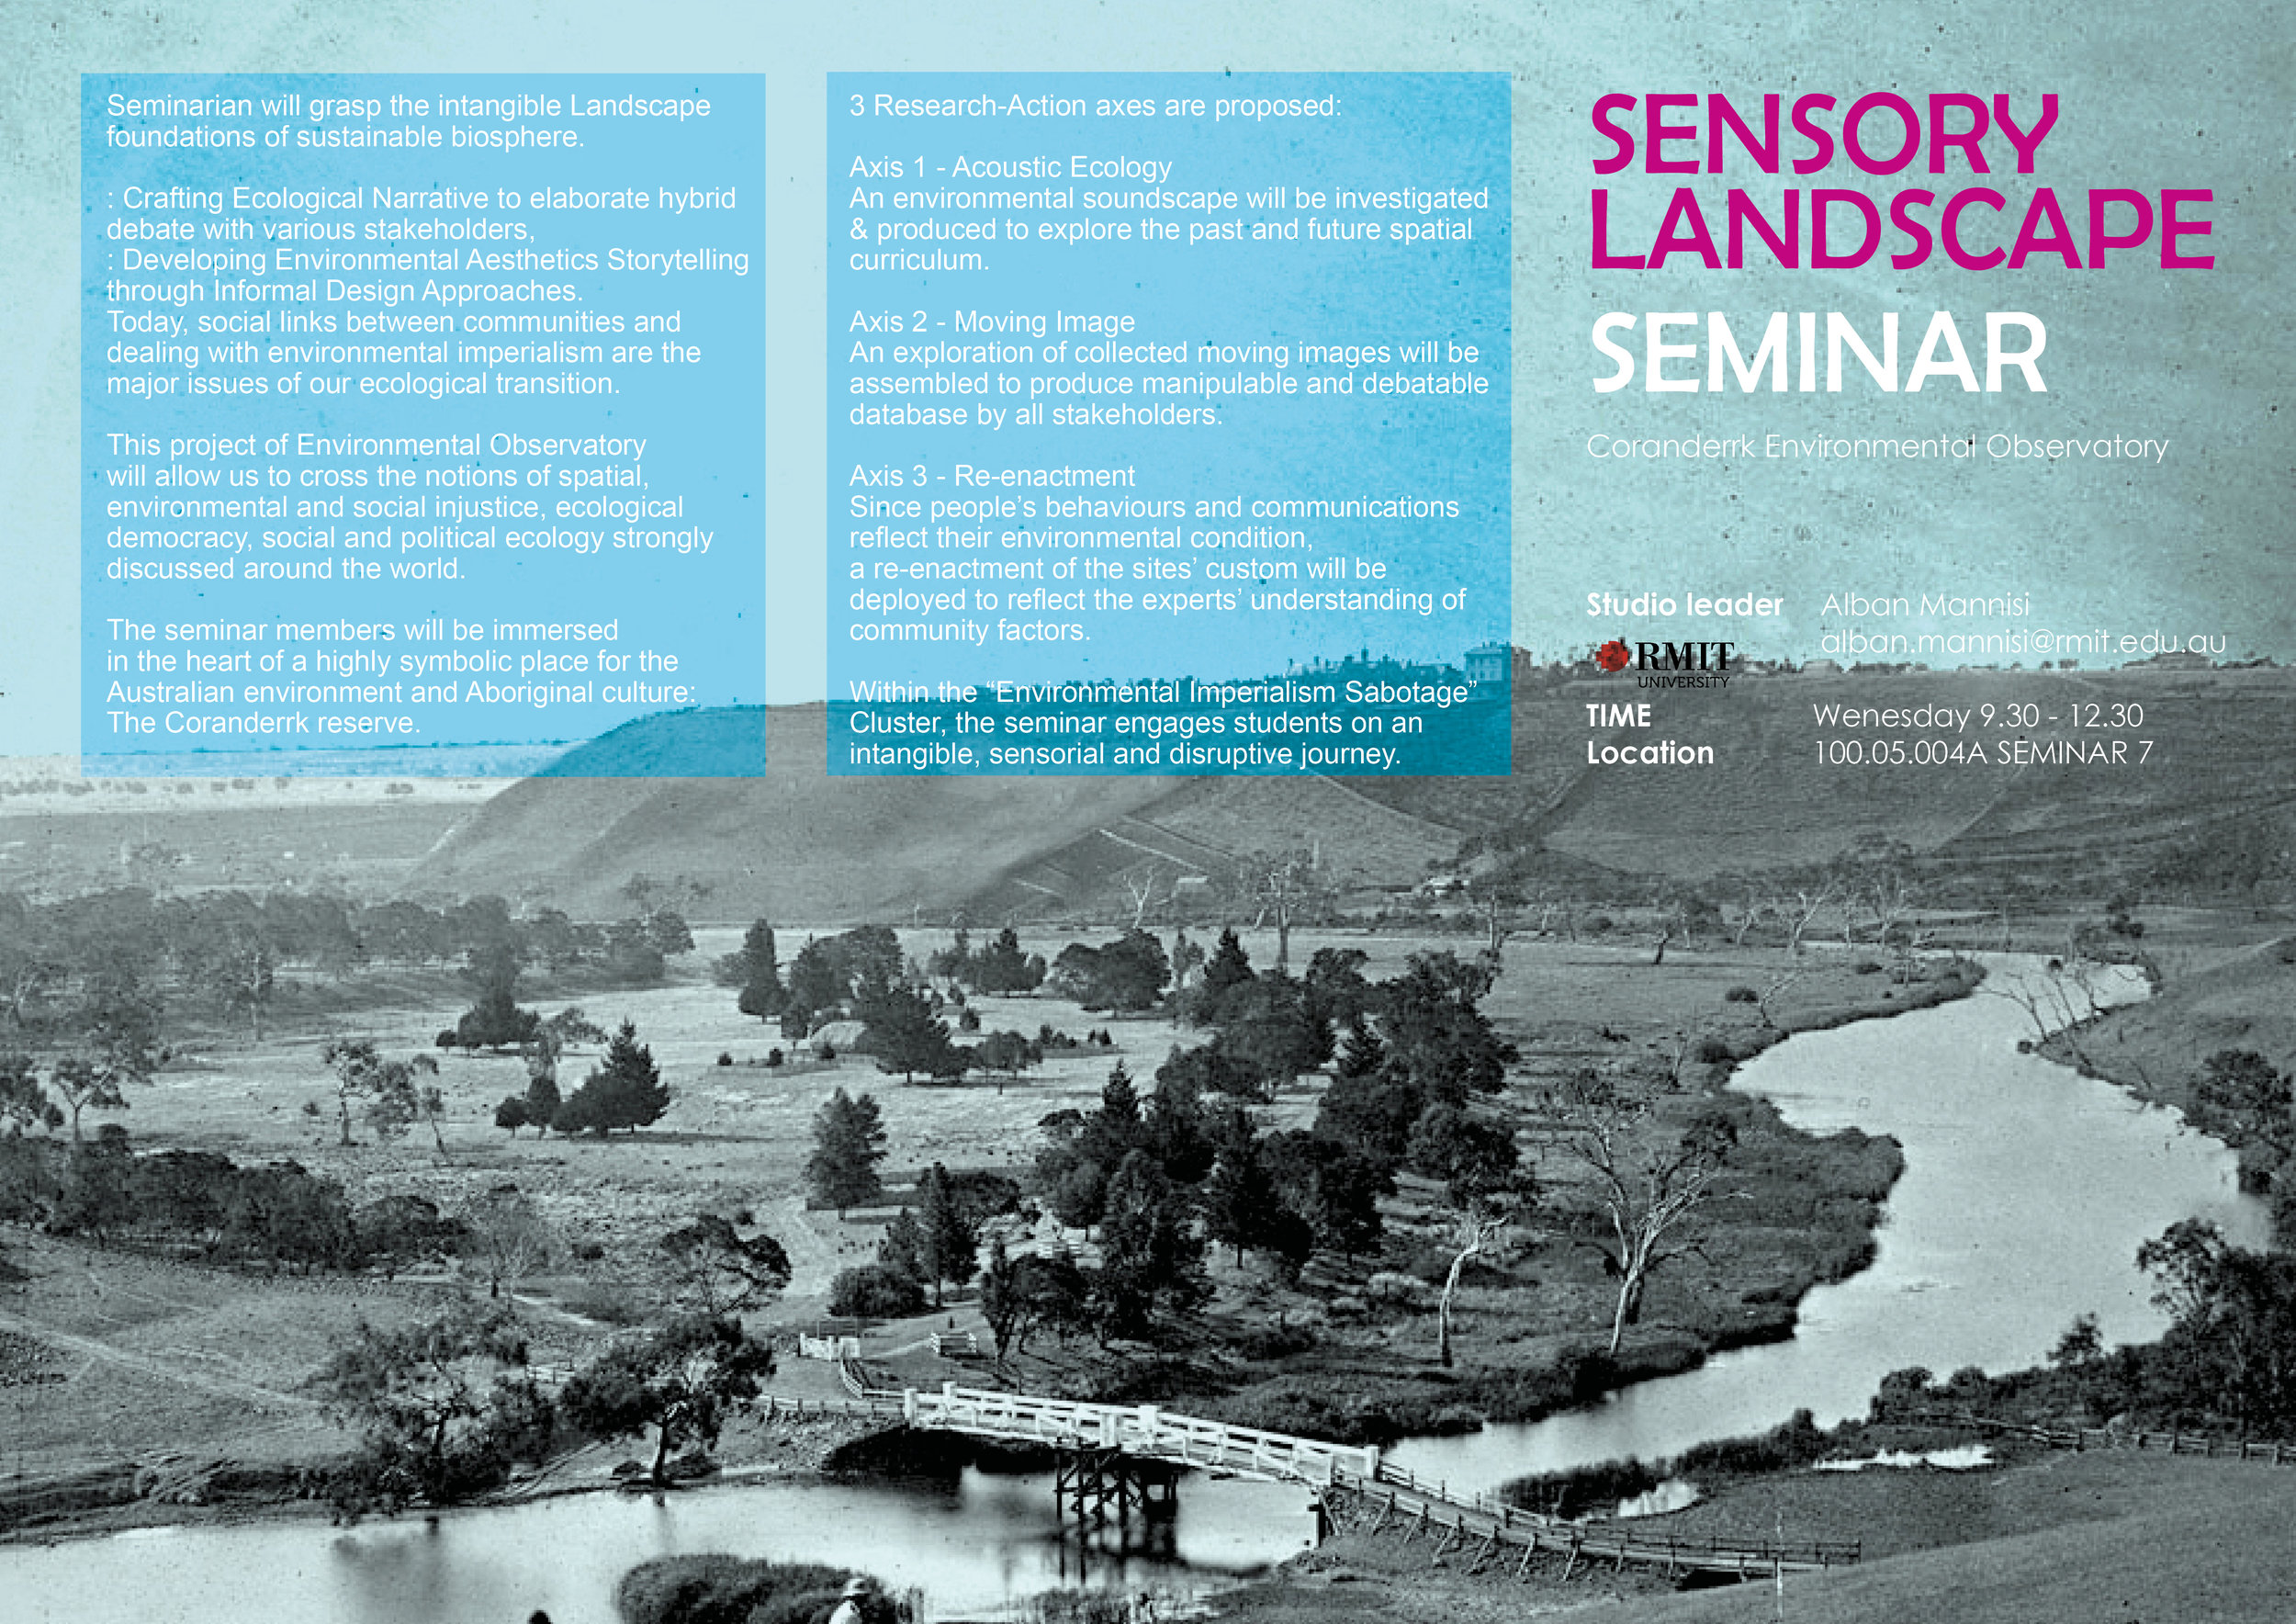 SensoryLandscapeSEMINAR_Poster.jpg